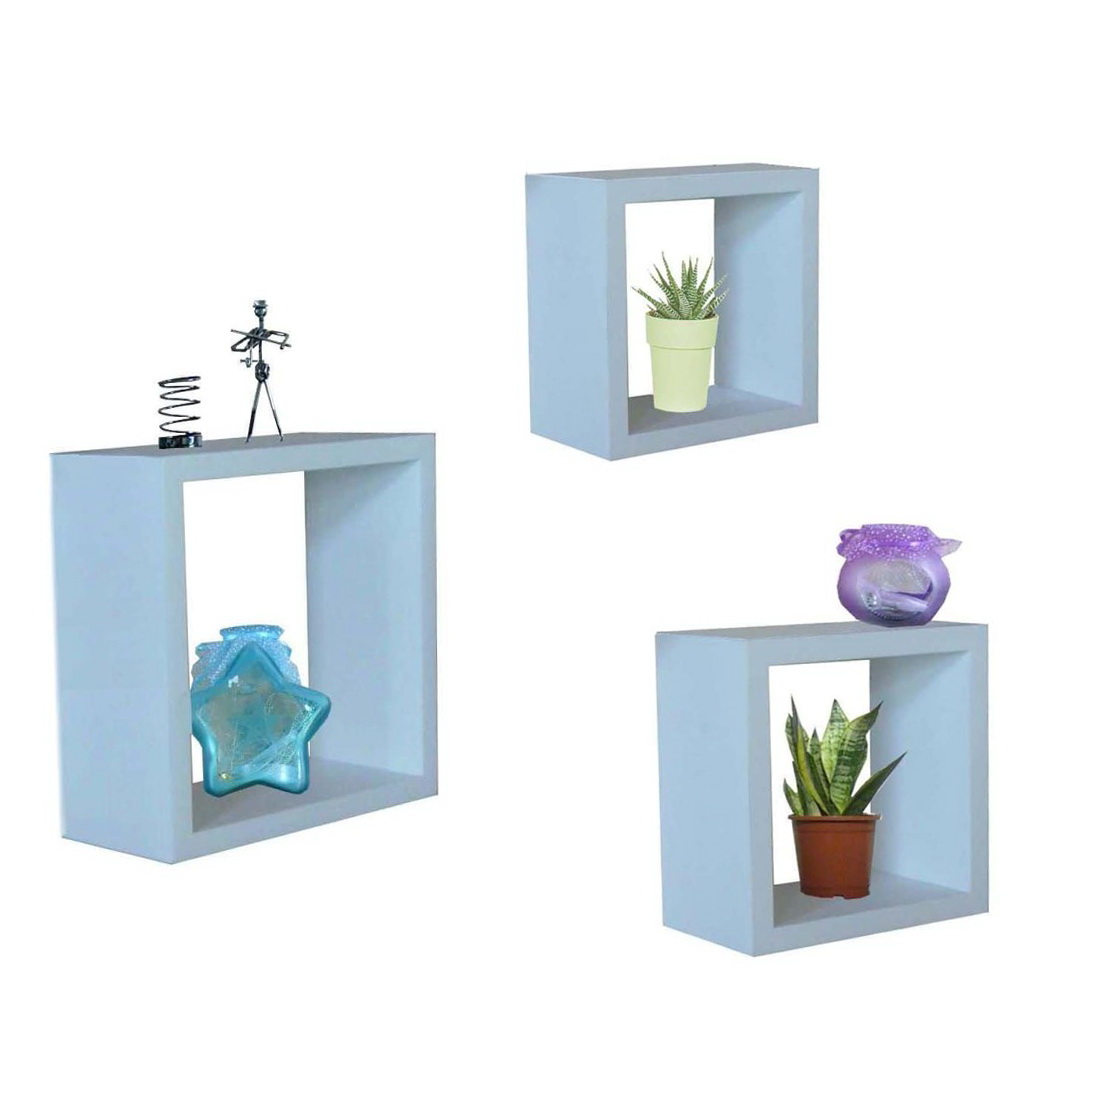 Decorative Wall Shelves Ideas